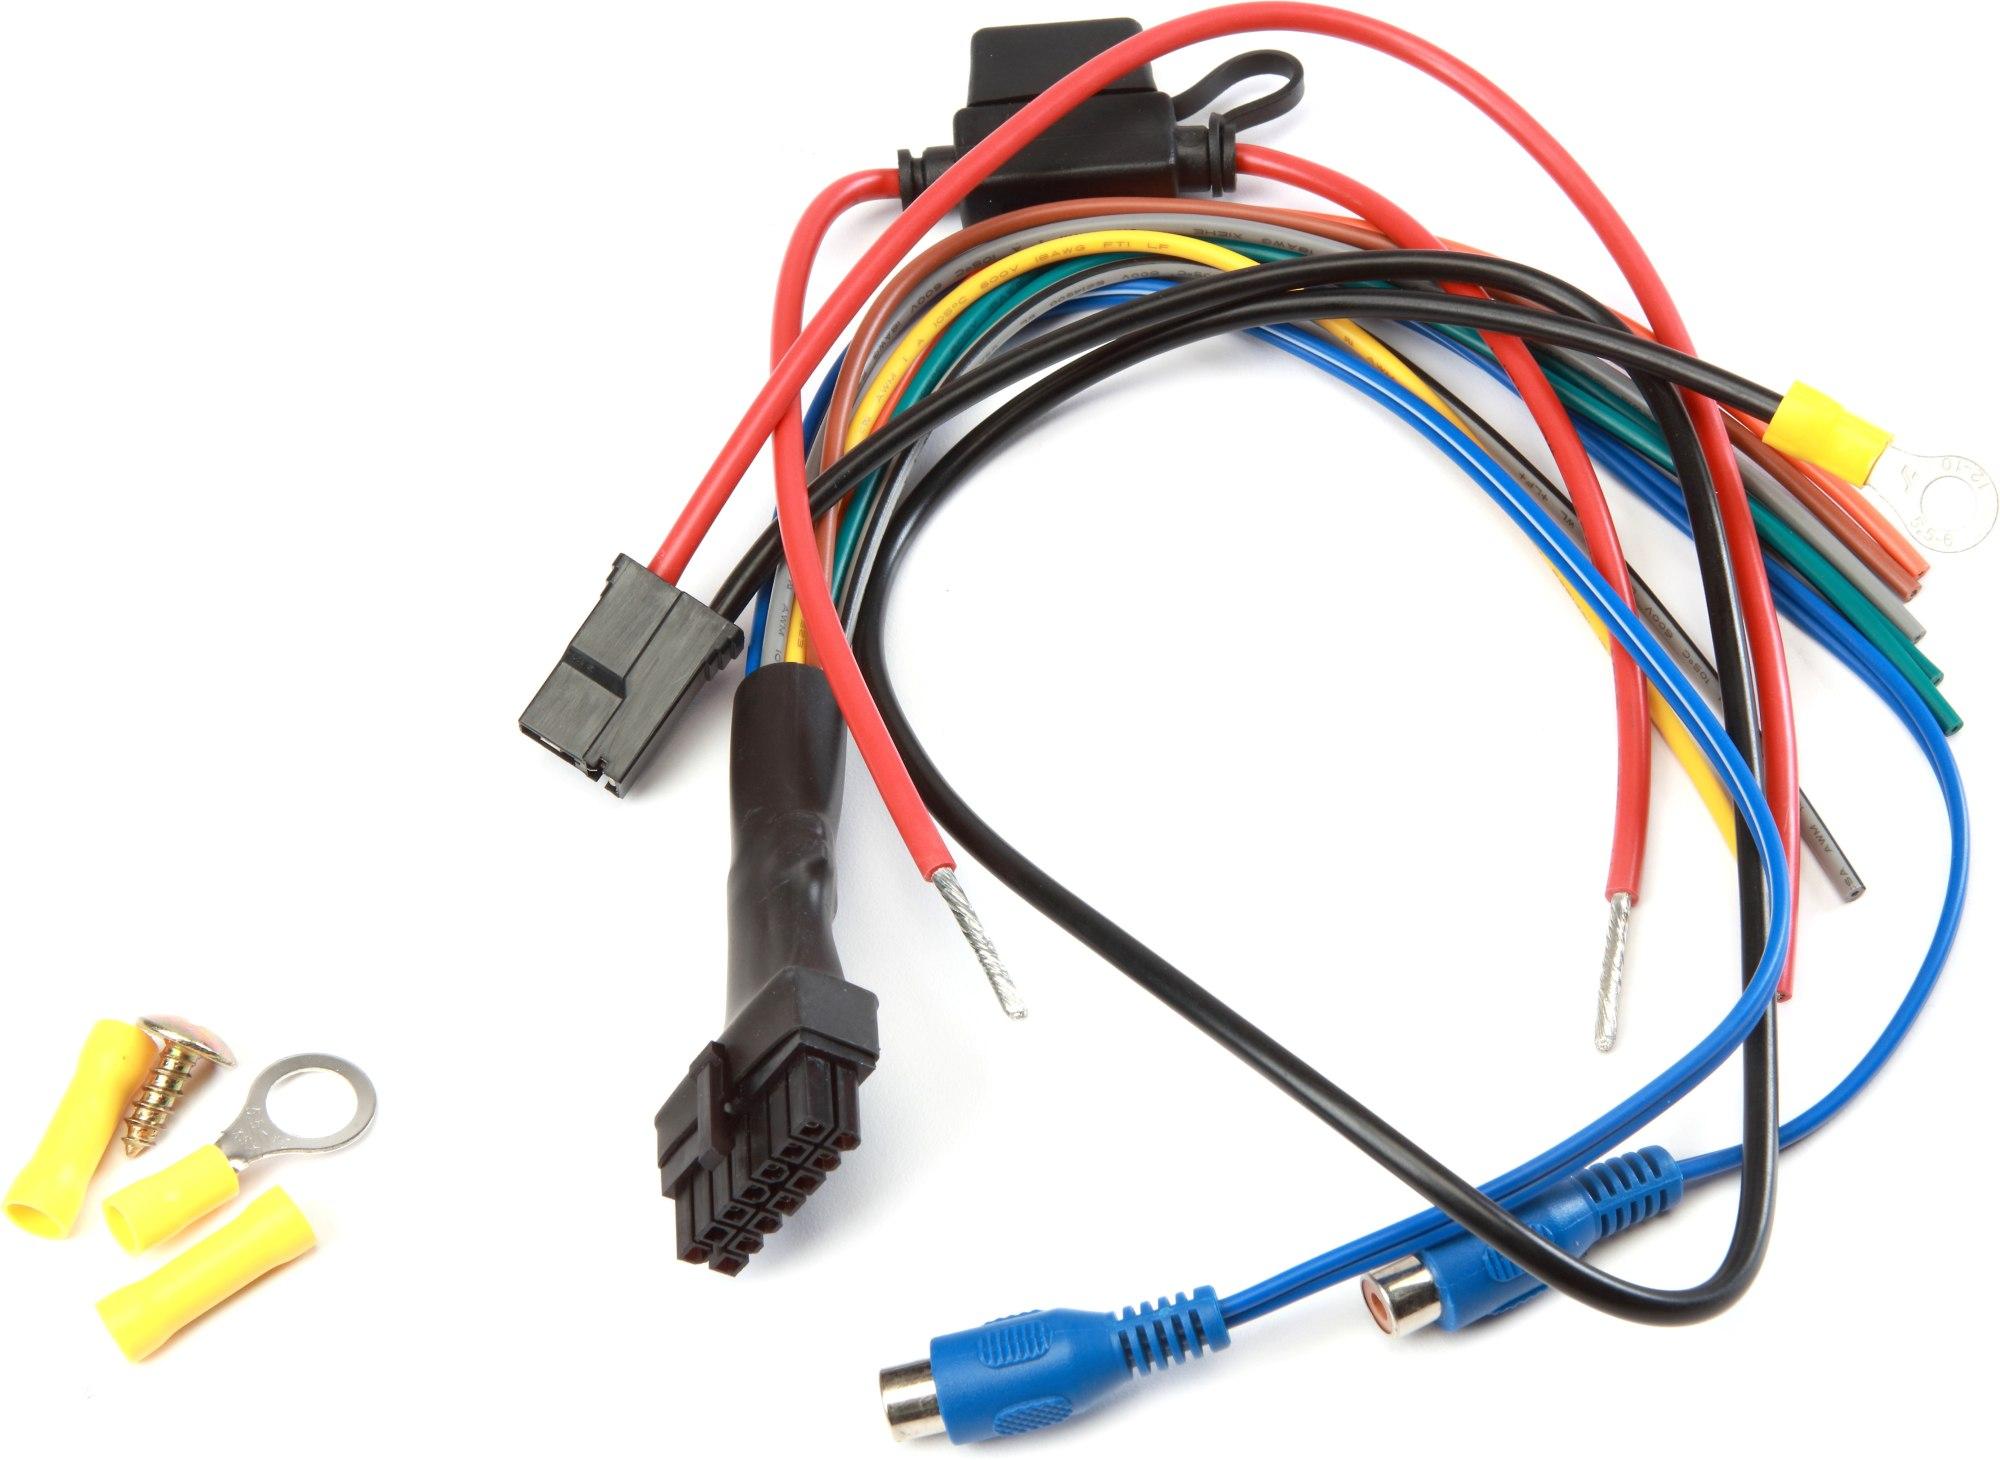 hight resolution of bazooka bta 250d awk amp wiring kit replacement wiring kit for bta series amplified bazooka tubes enclosures at crutchfield com